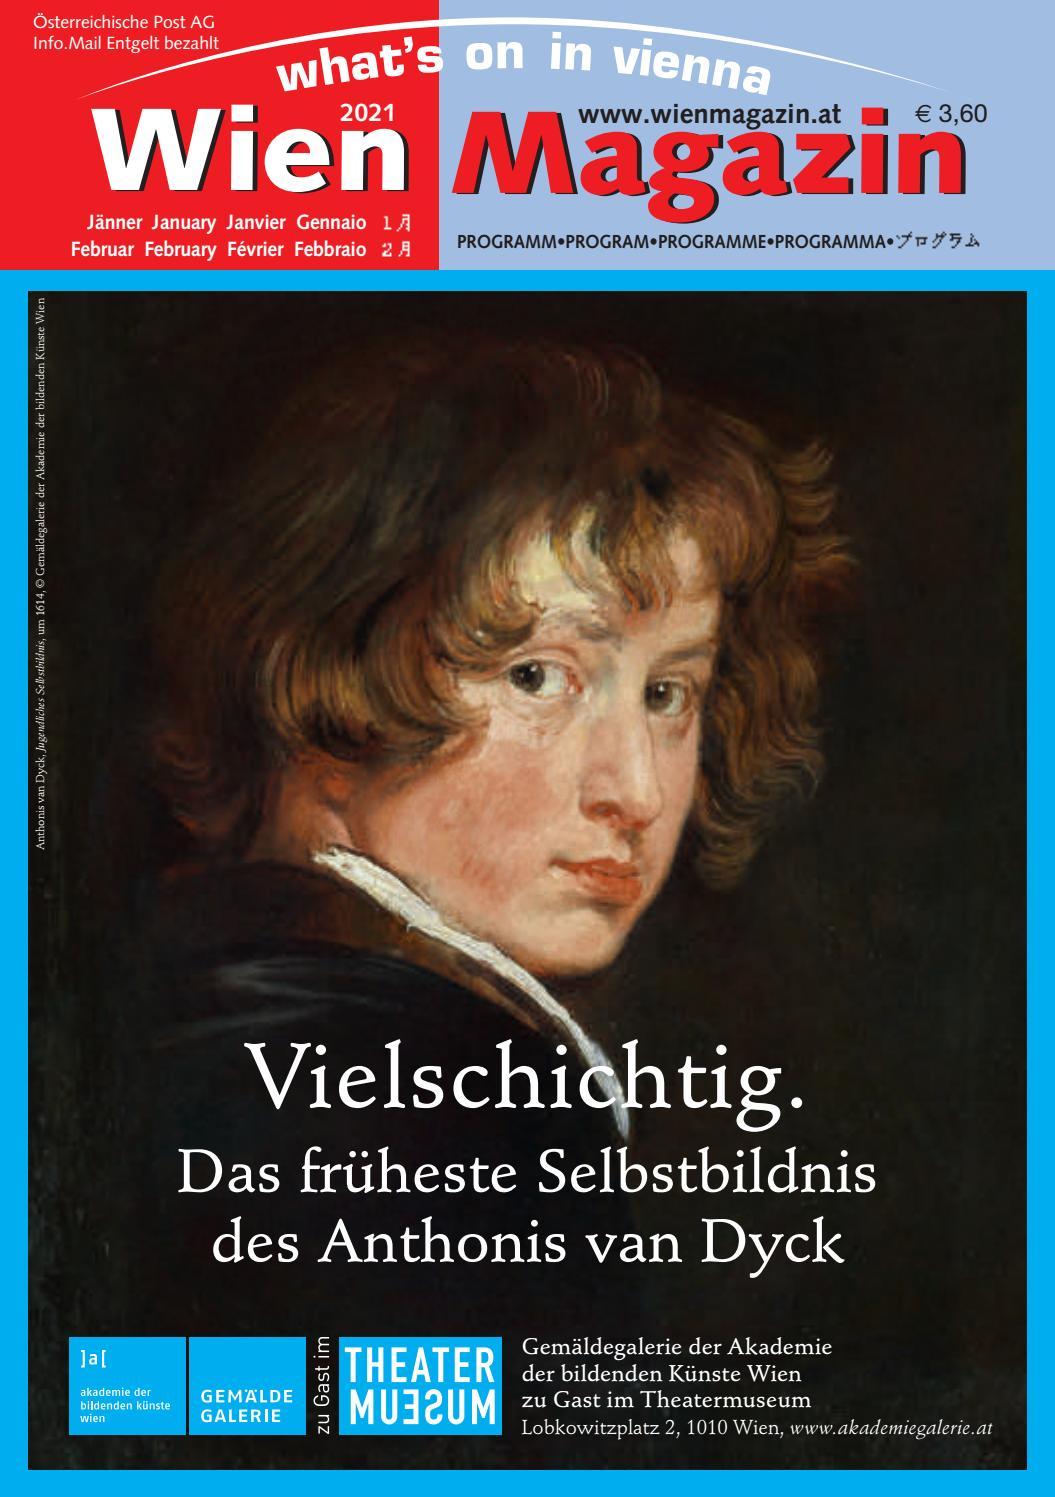 Wien Magazin 8 8 281 by Waltraud Edelmayer   issuu